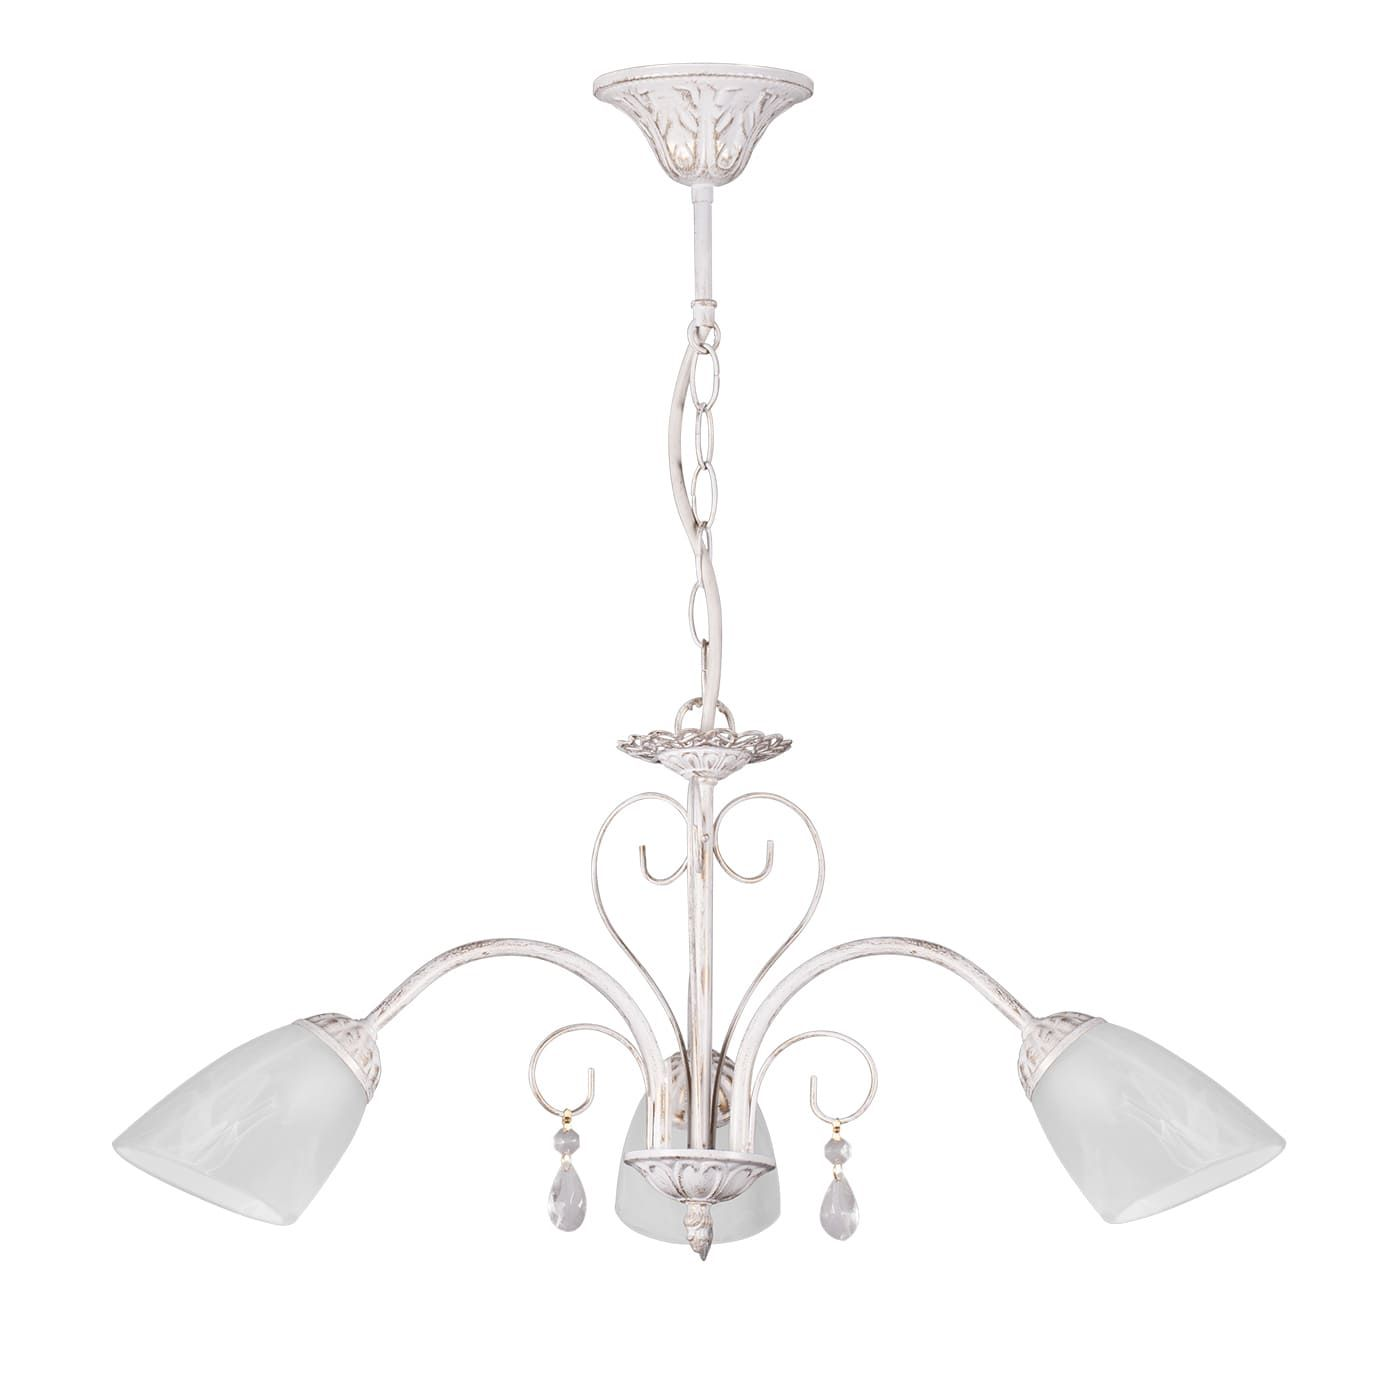 PETRASVET / Pendant chandelier S2005-3, 3xE14 max. 60W